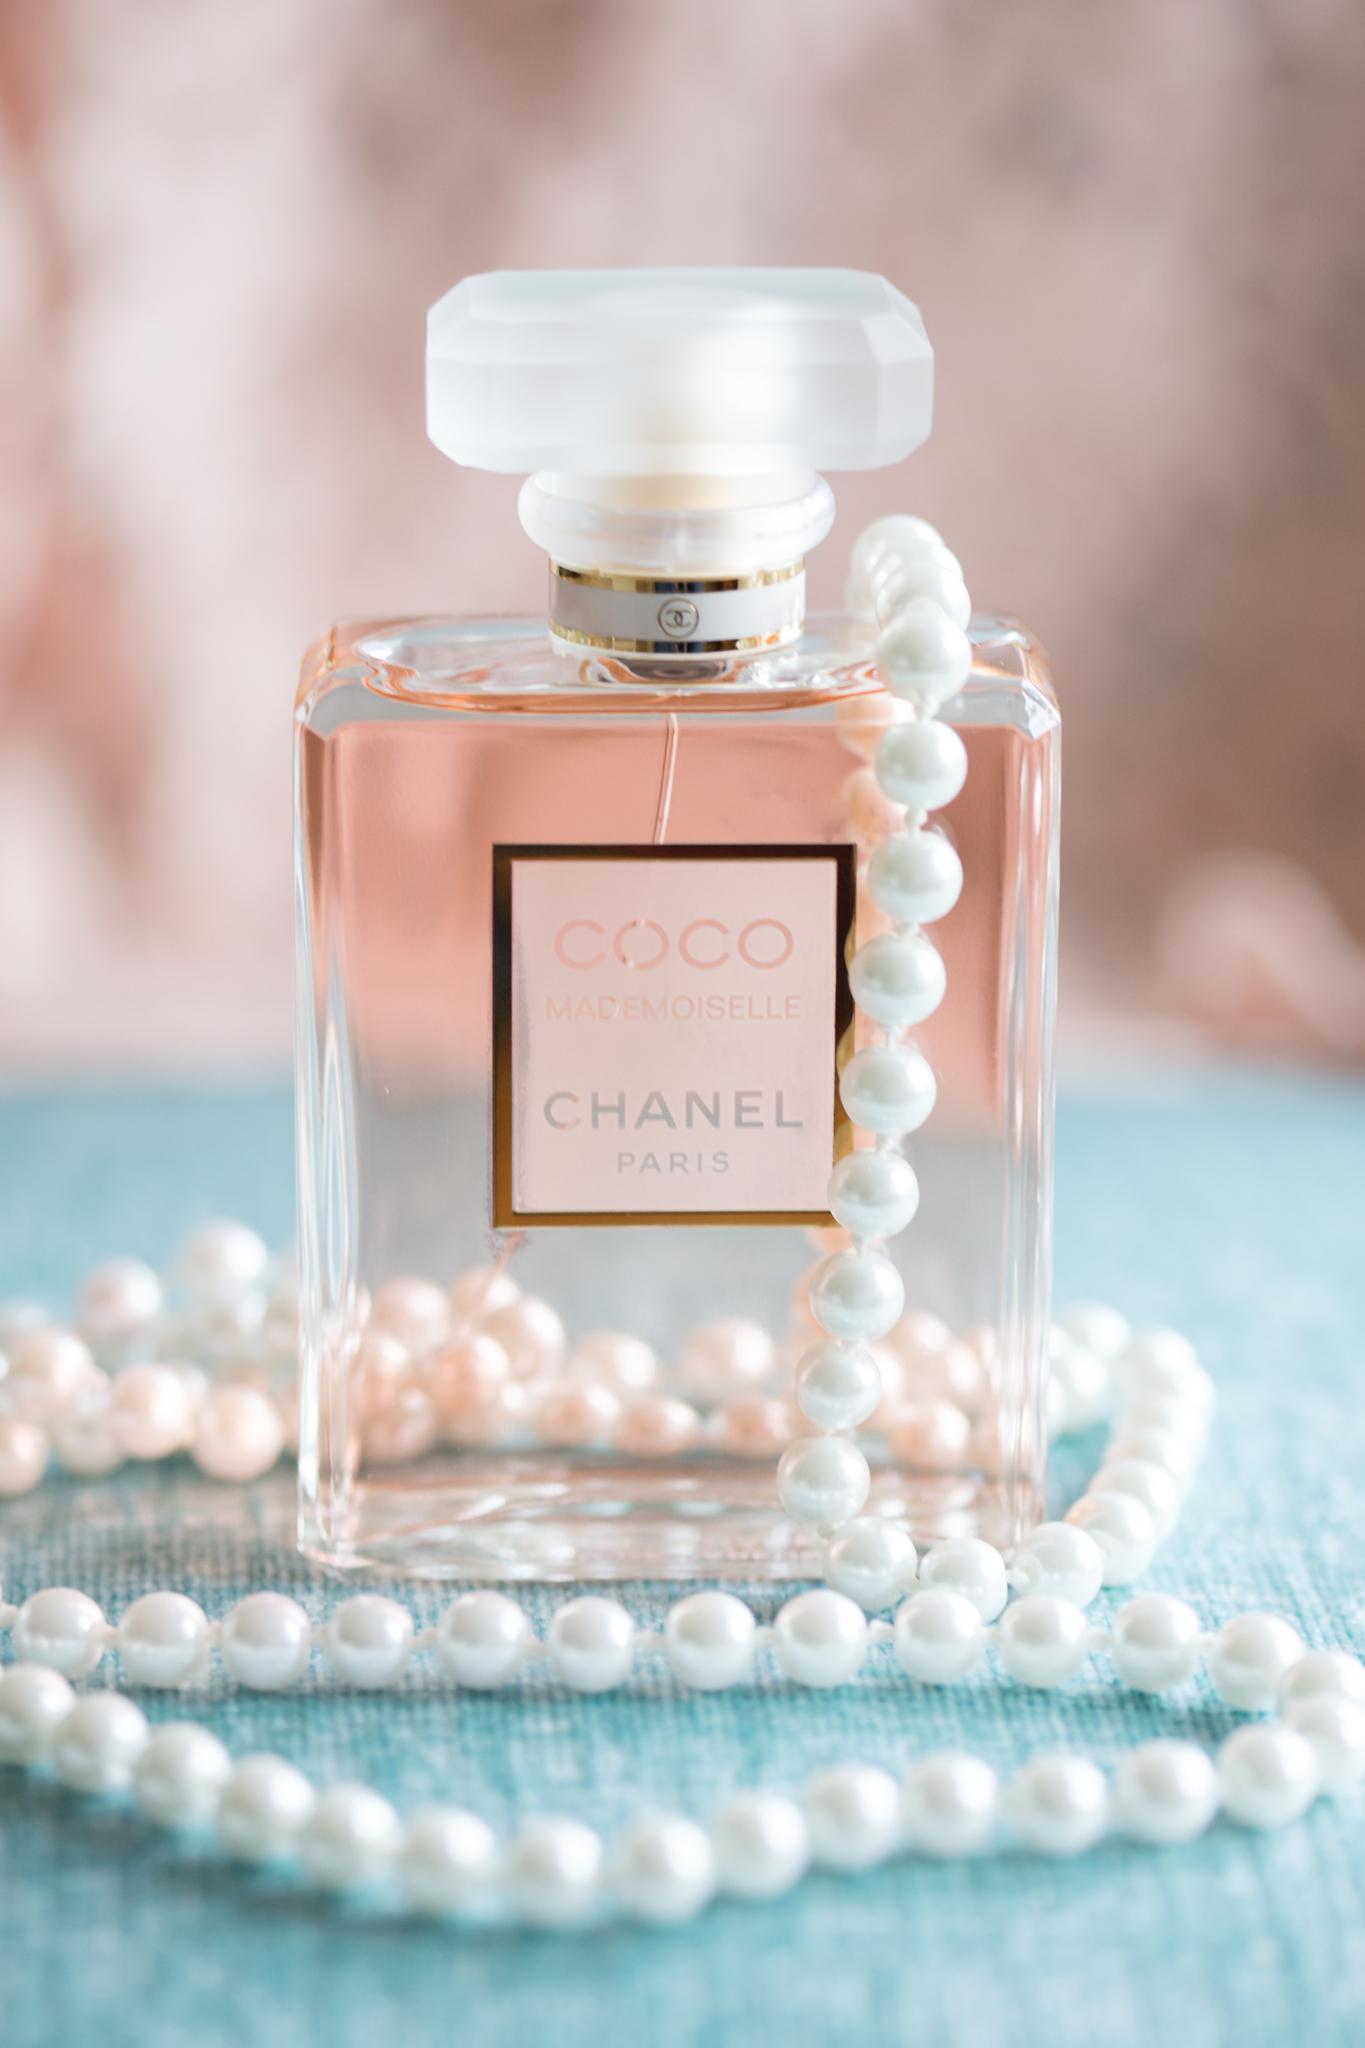 A Few of My Favorite Things   Chanel Coco Mademoiselle Perfume   Shaina Lee Photography   CT, NYC, Hawaii + Destination Wedding + Engagement Photographer   Wedding Planning   Wedding + Bridal Perfume